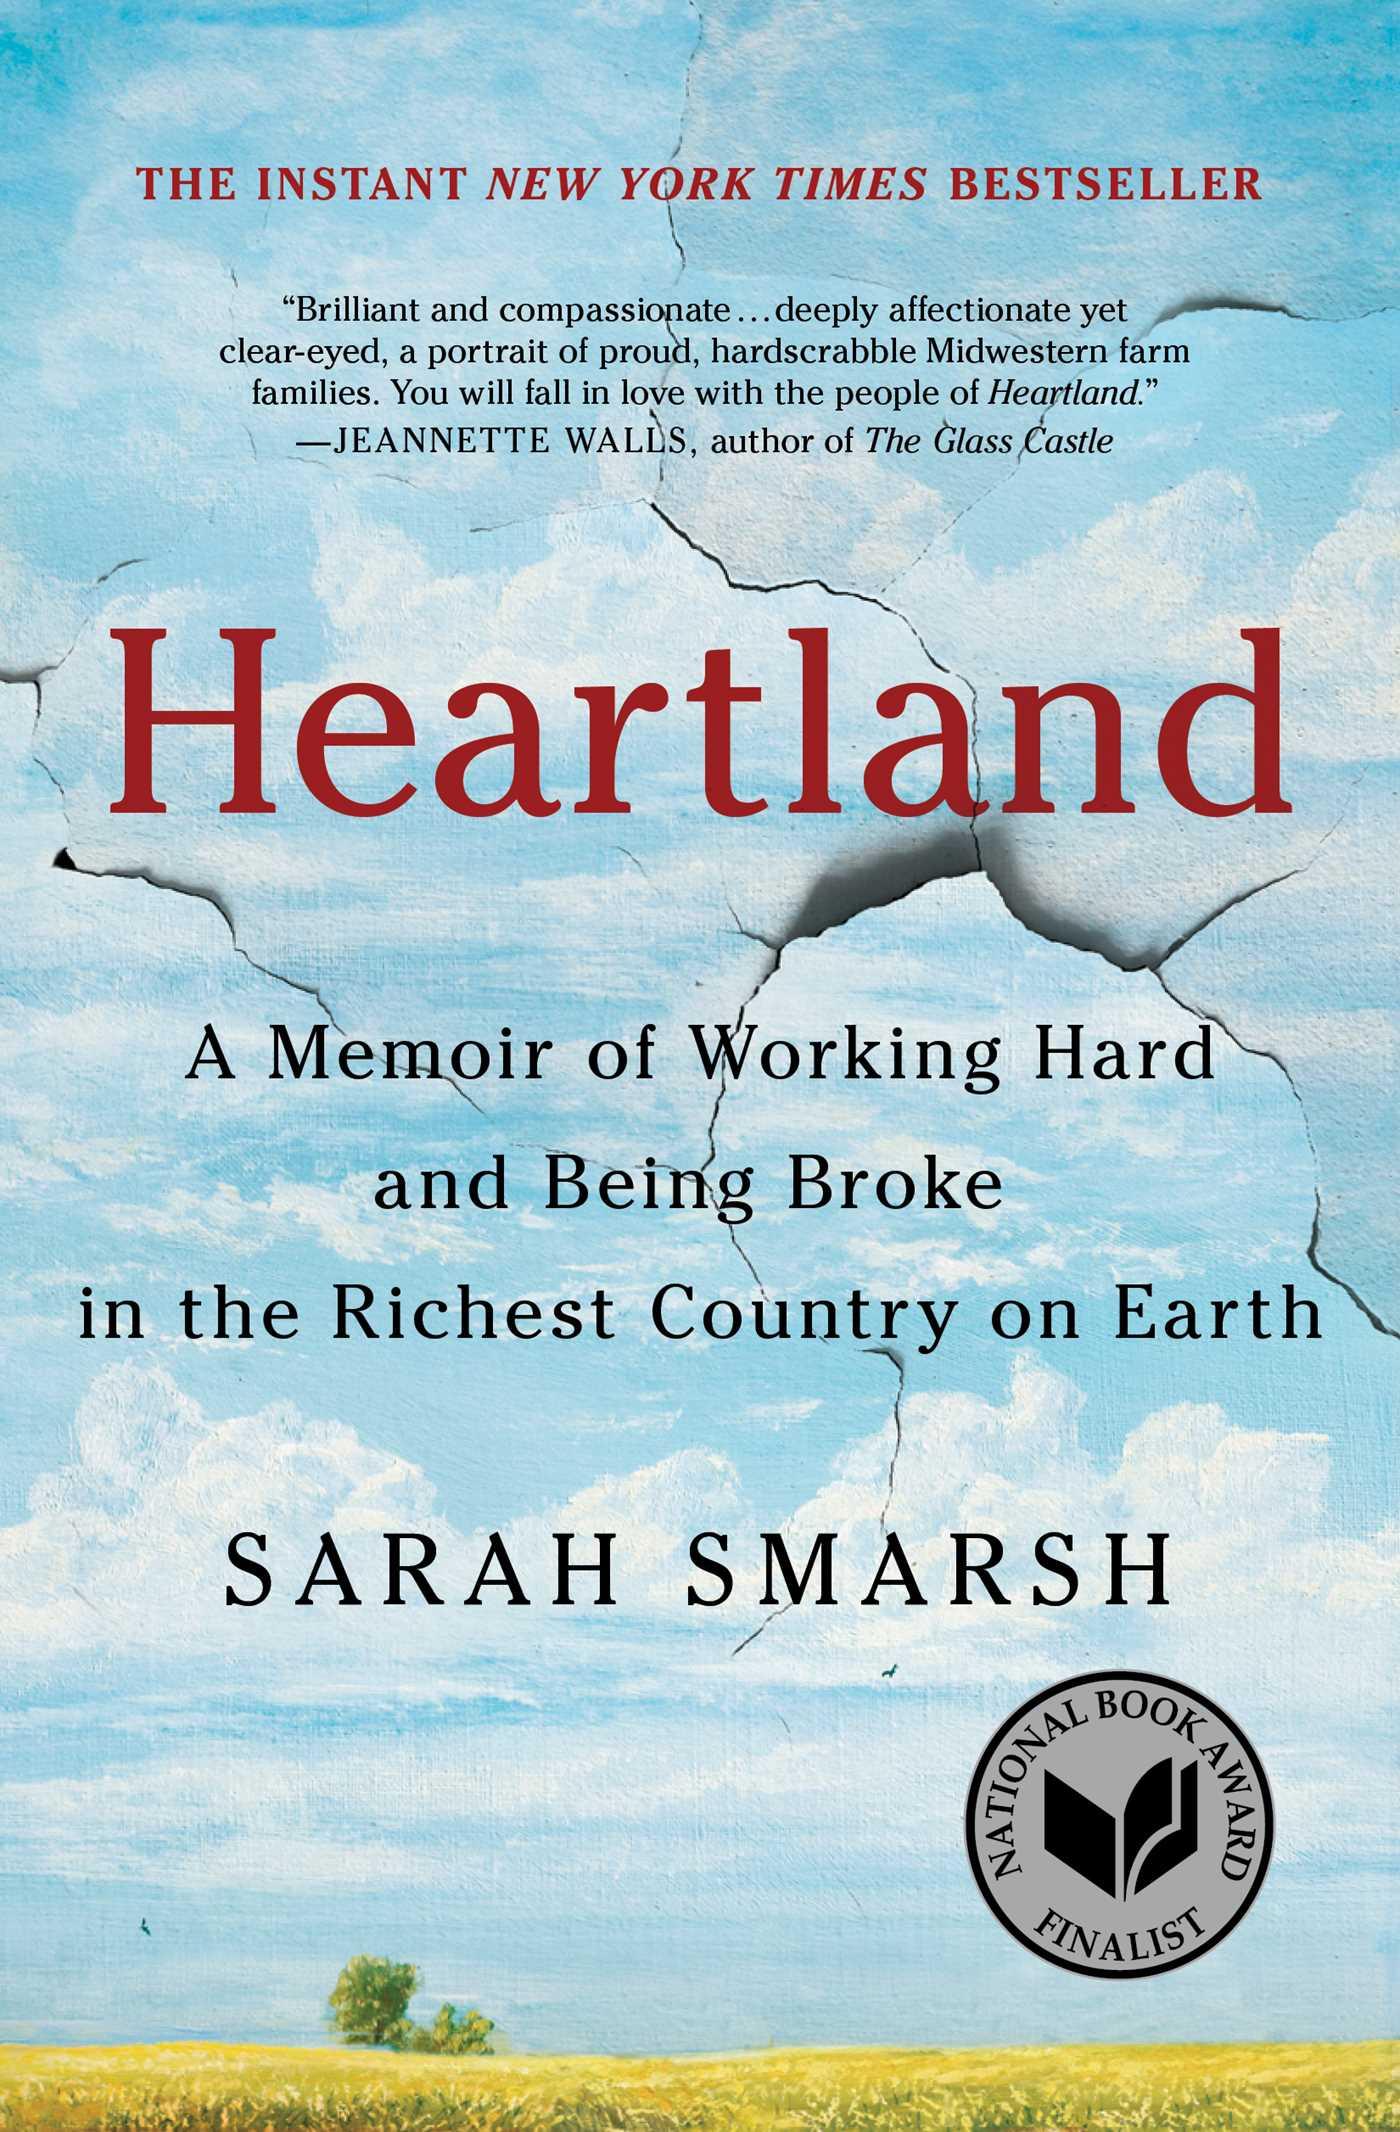 Heartland 9781501133114 hr